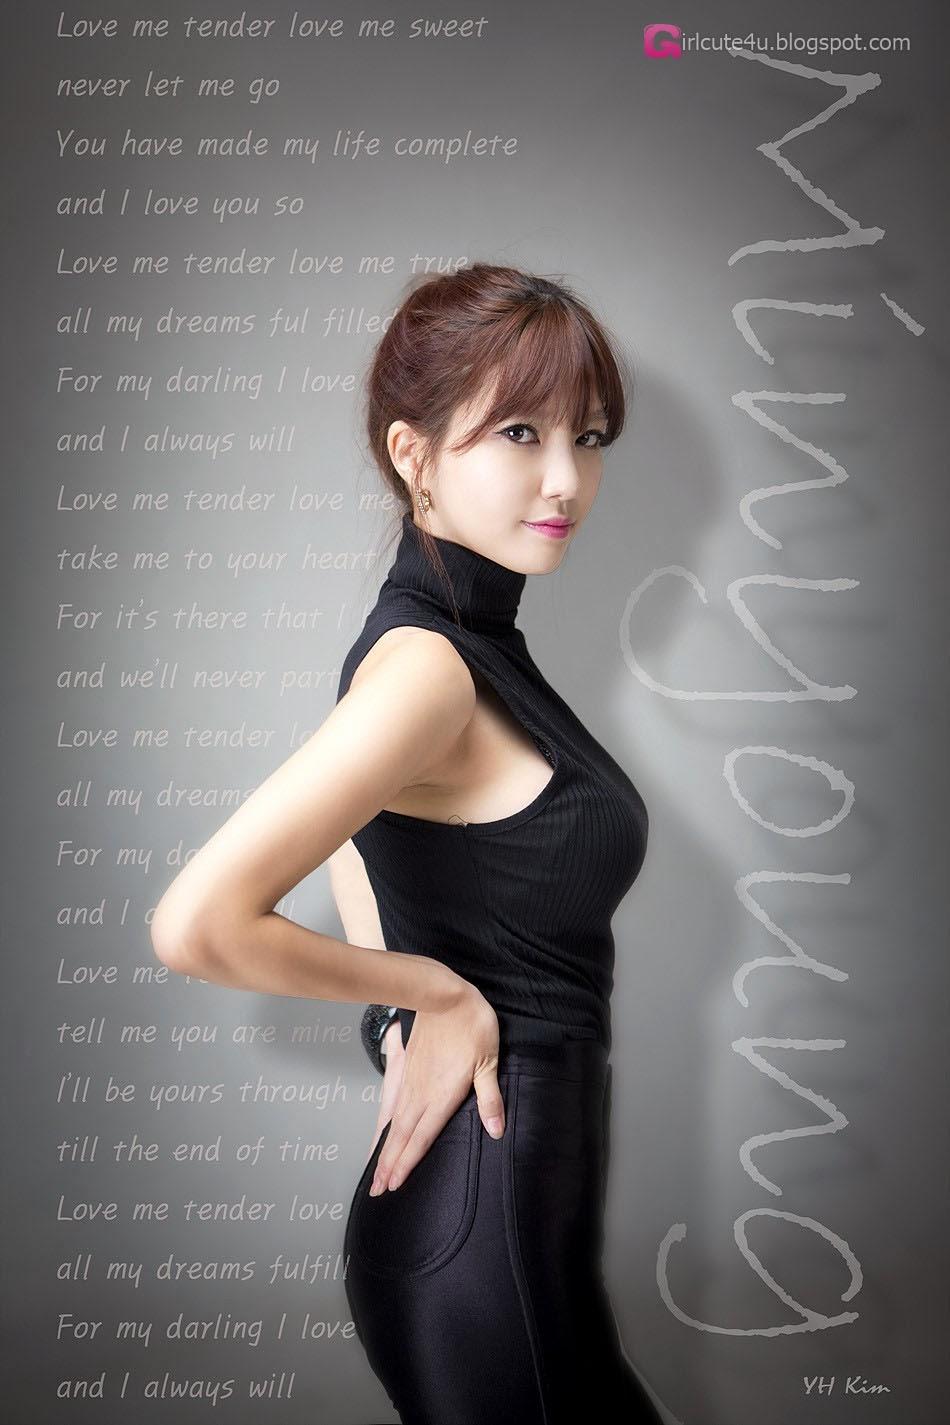 5 Han Min Young - Black lady - very cute asian girl-girlcute4u.blogspot.com